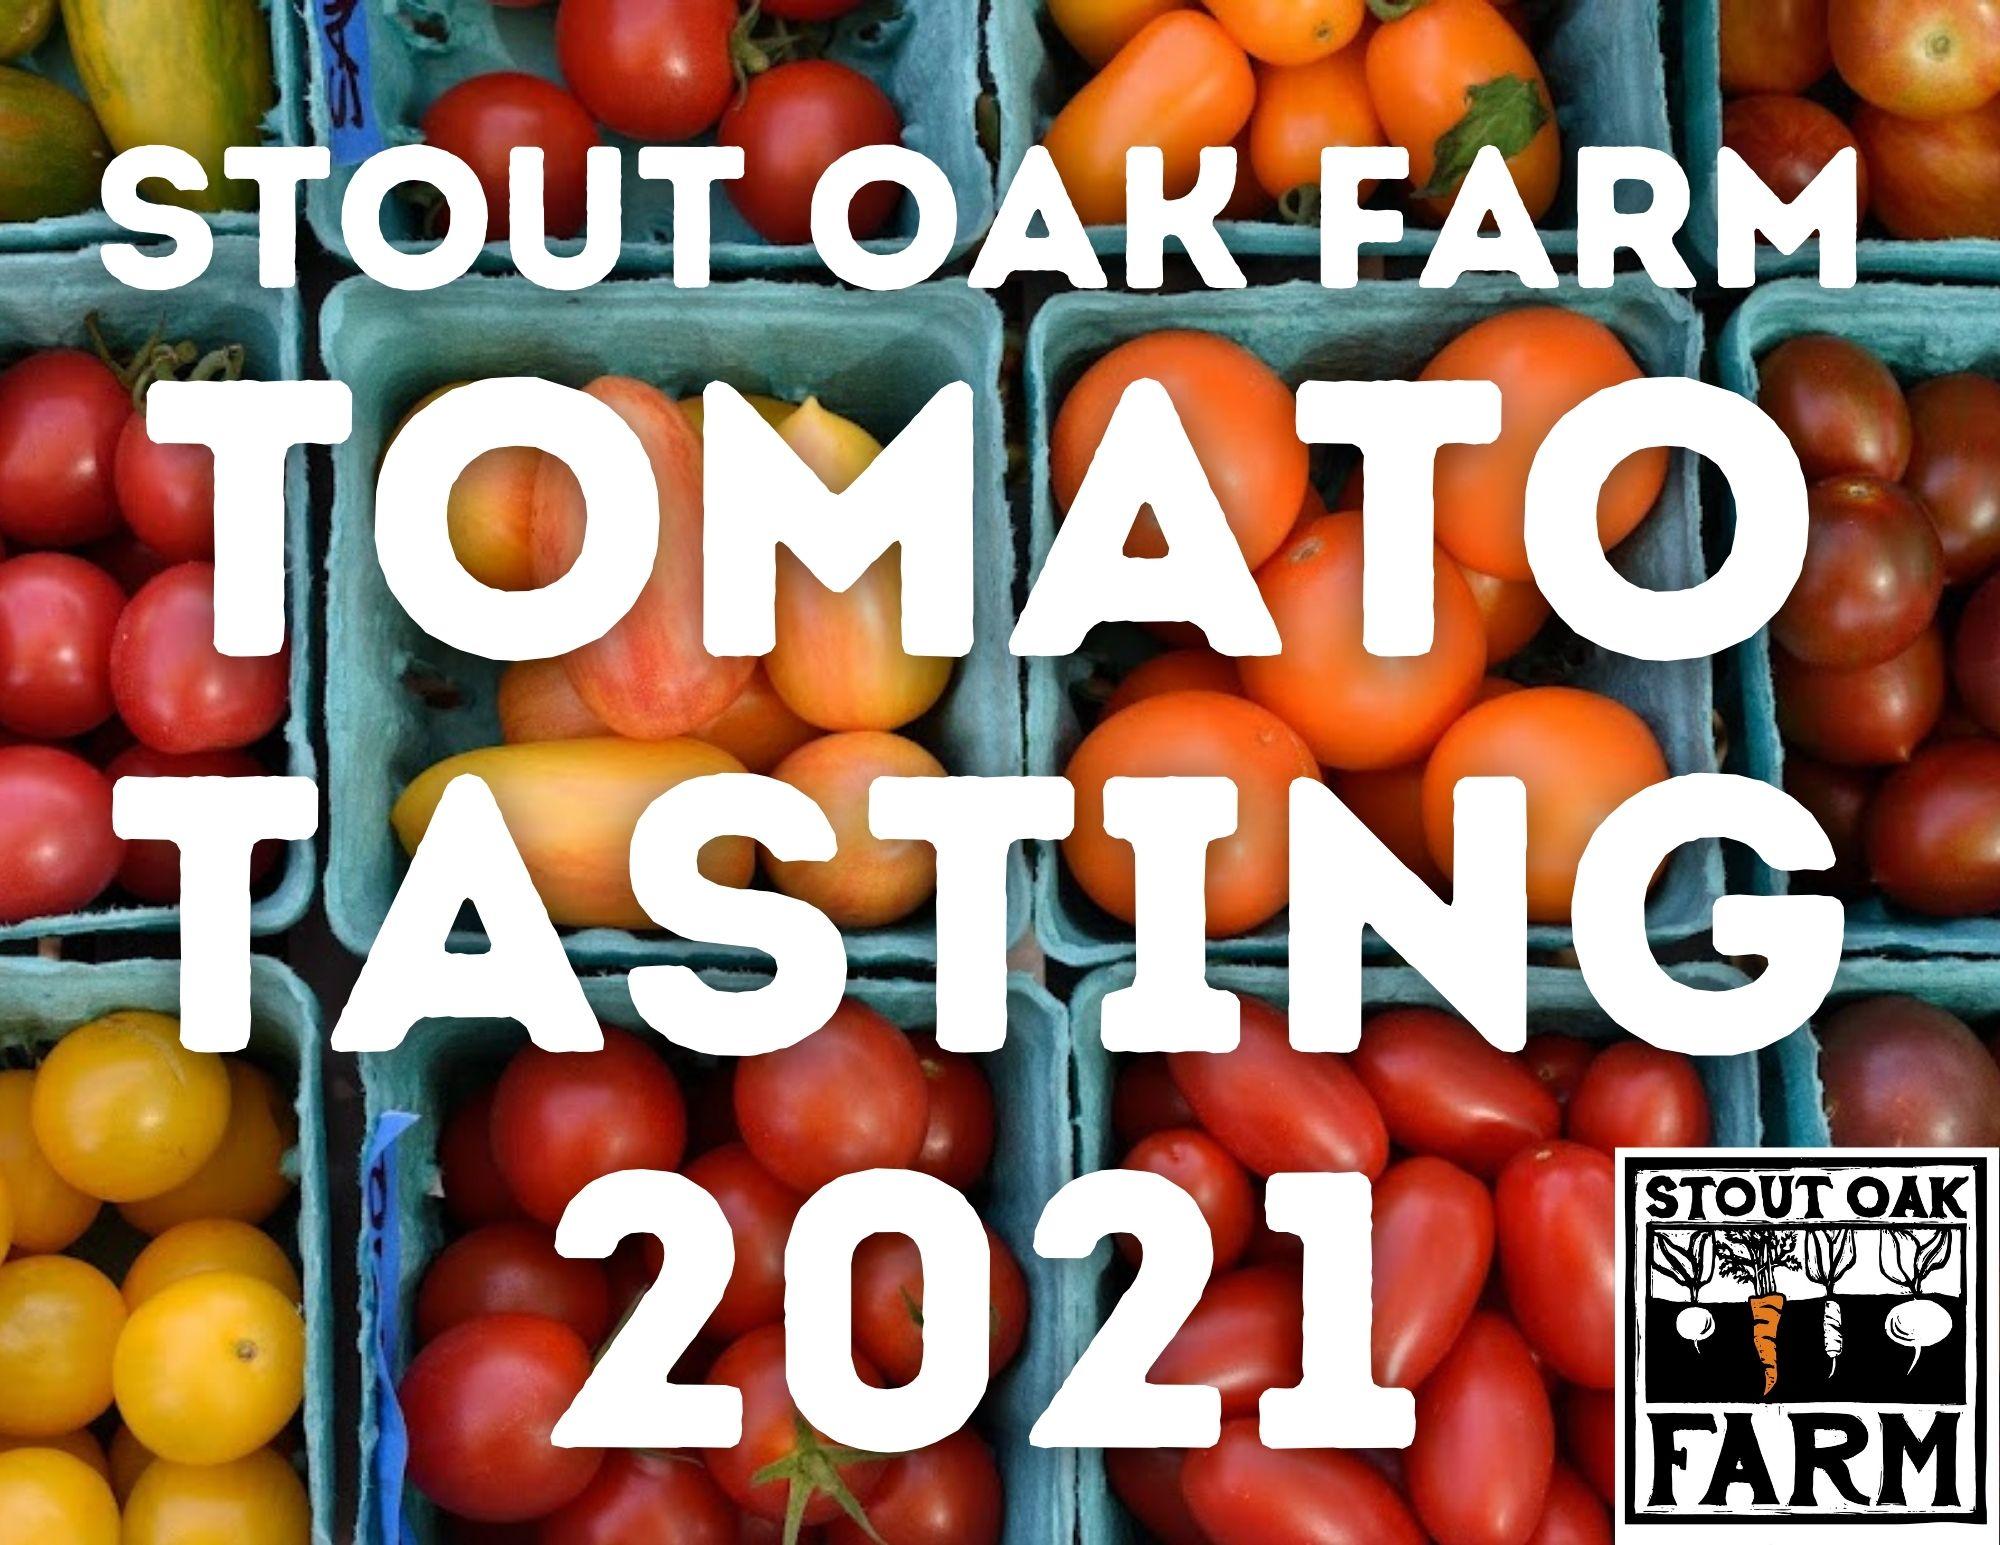 Stout Oak Farm Tomato Tasting 2021